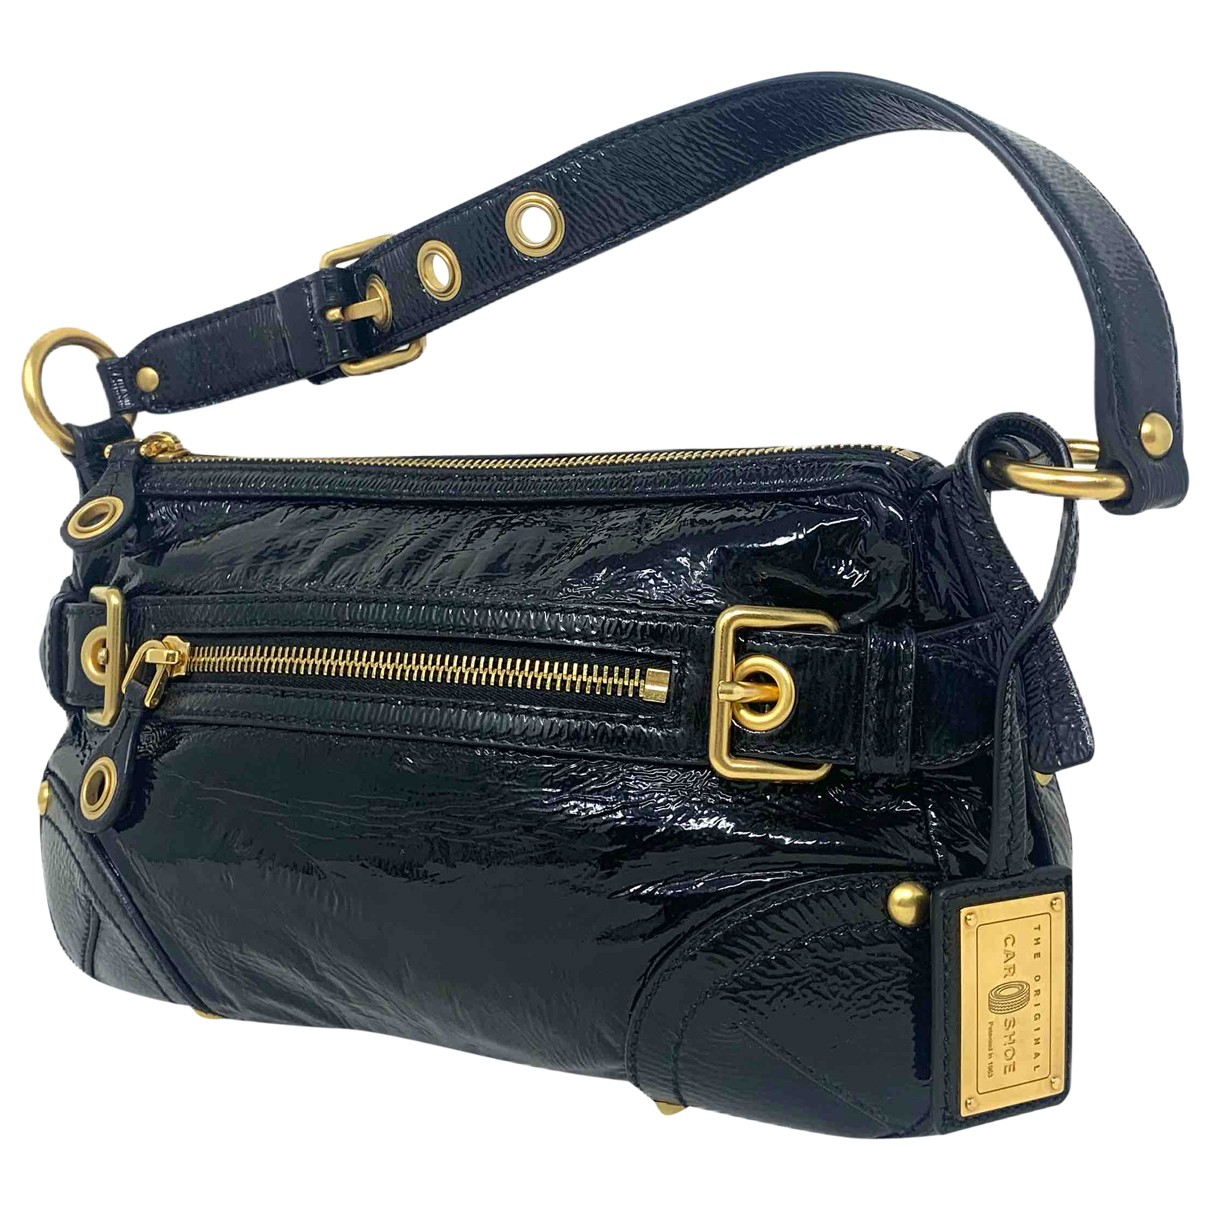 Carshoe \N Handtasche in  Schwarz Lackleder